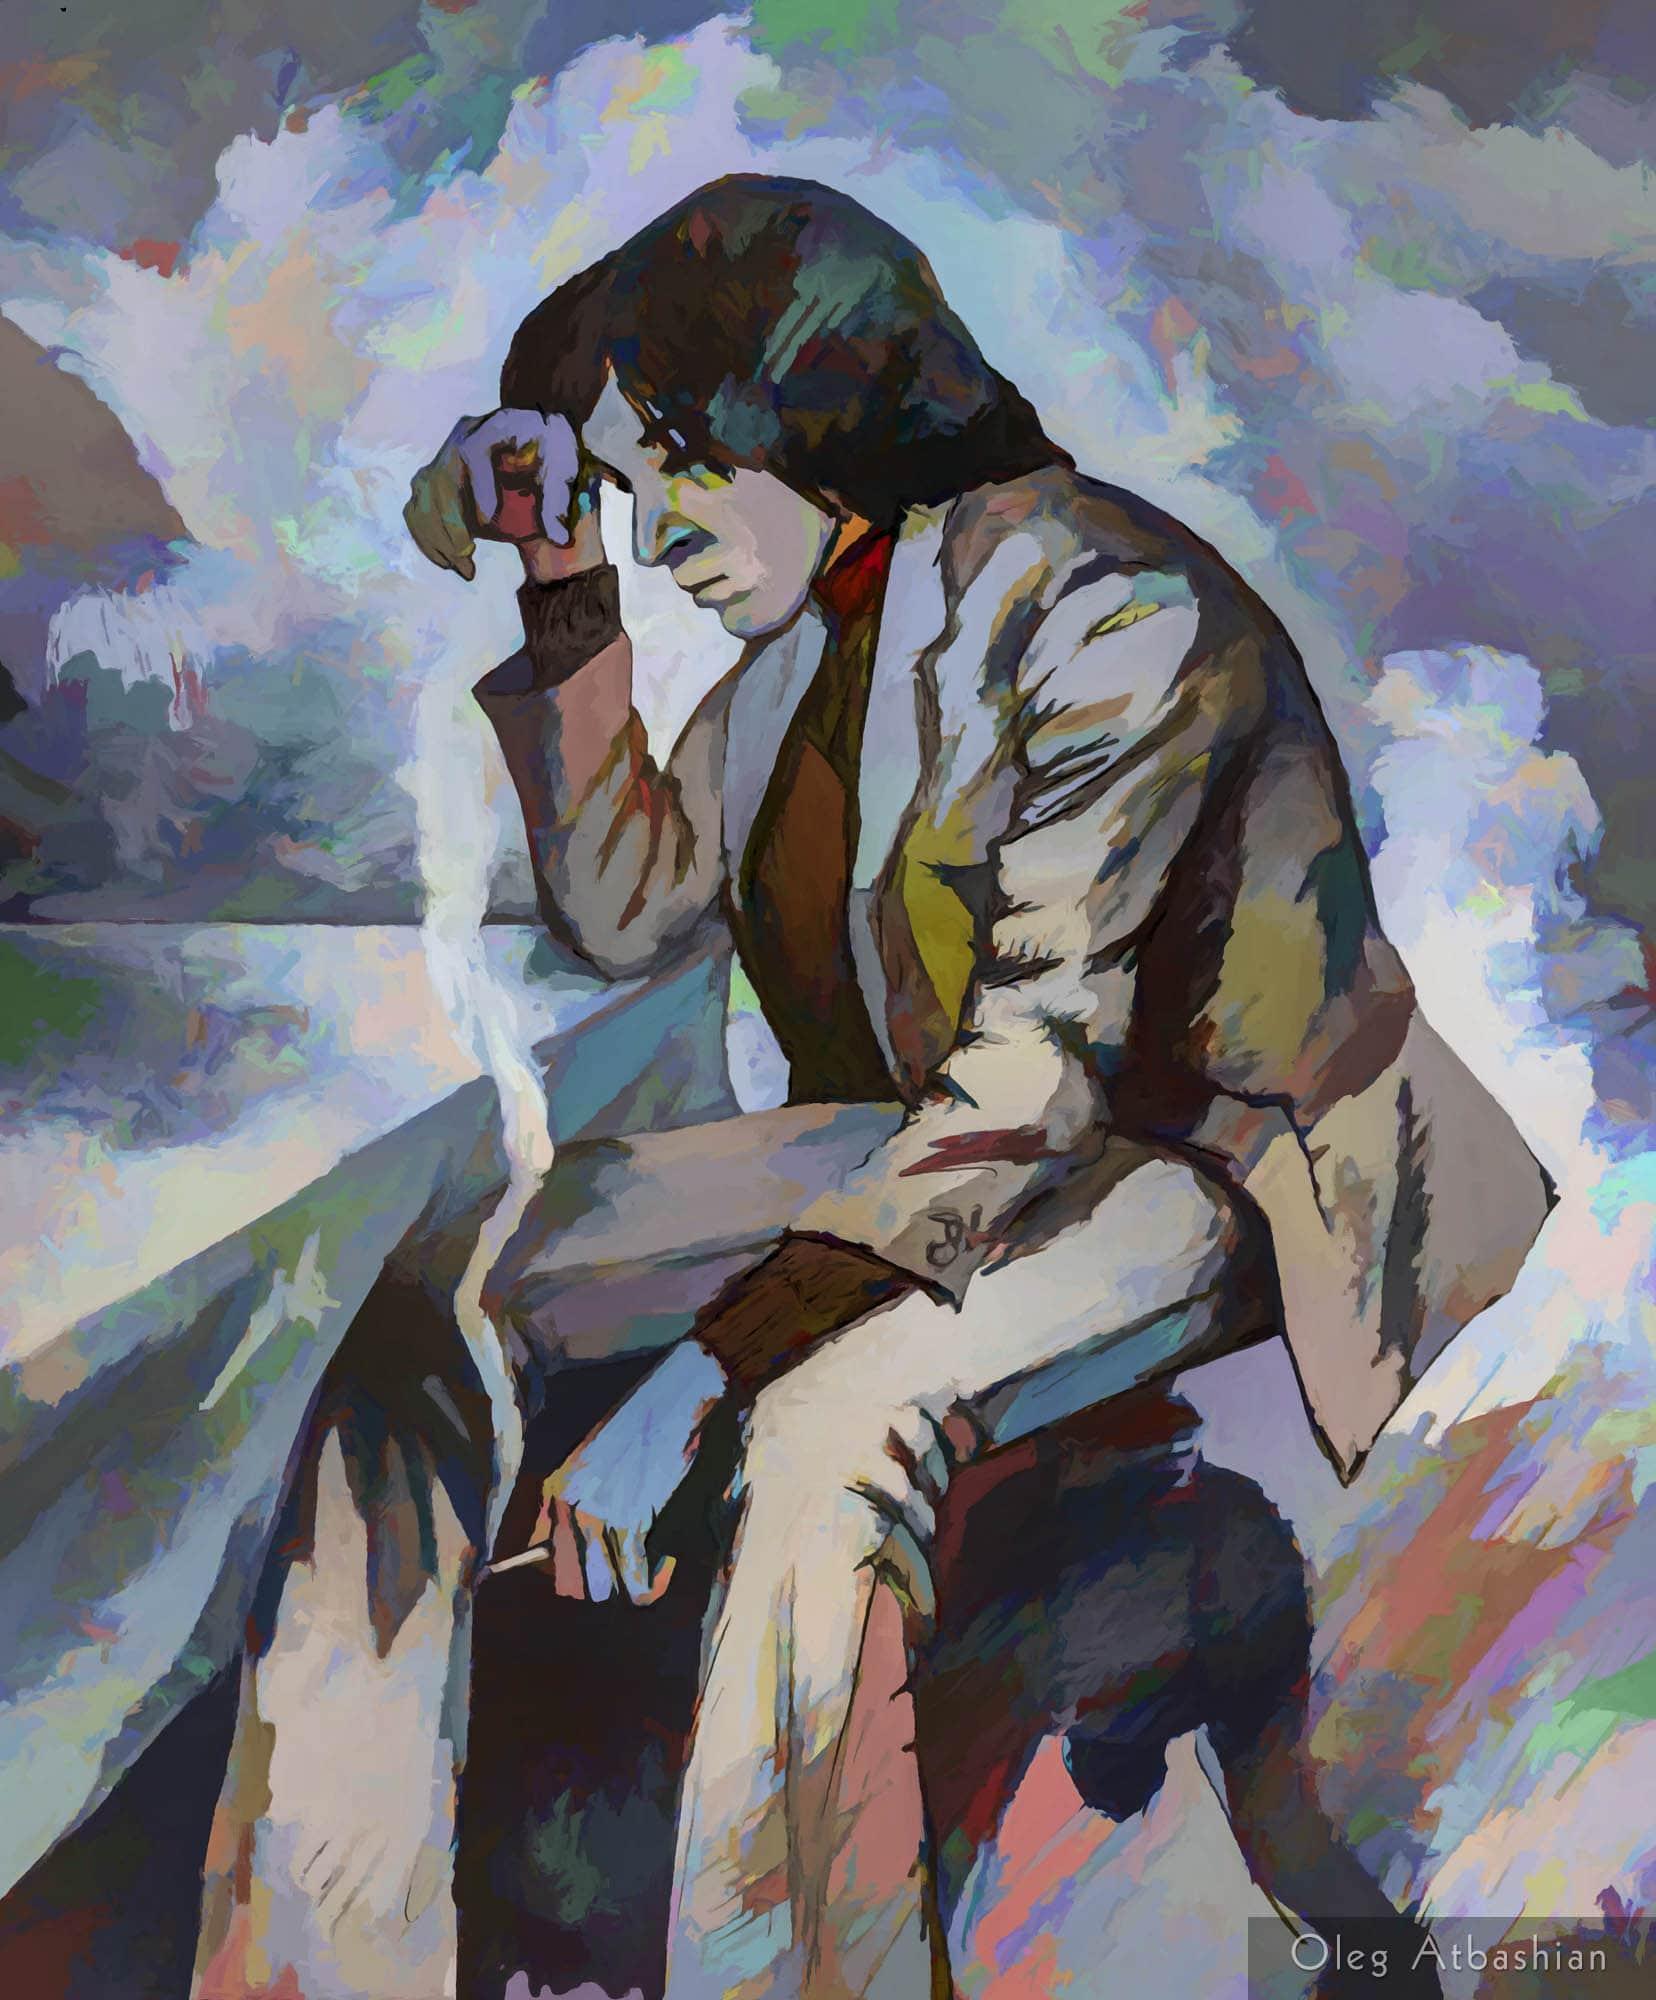 Portrait: Zubov the Thinker